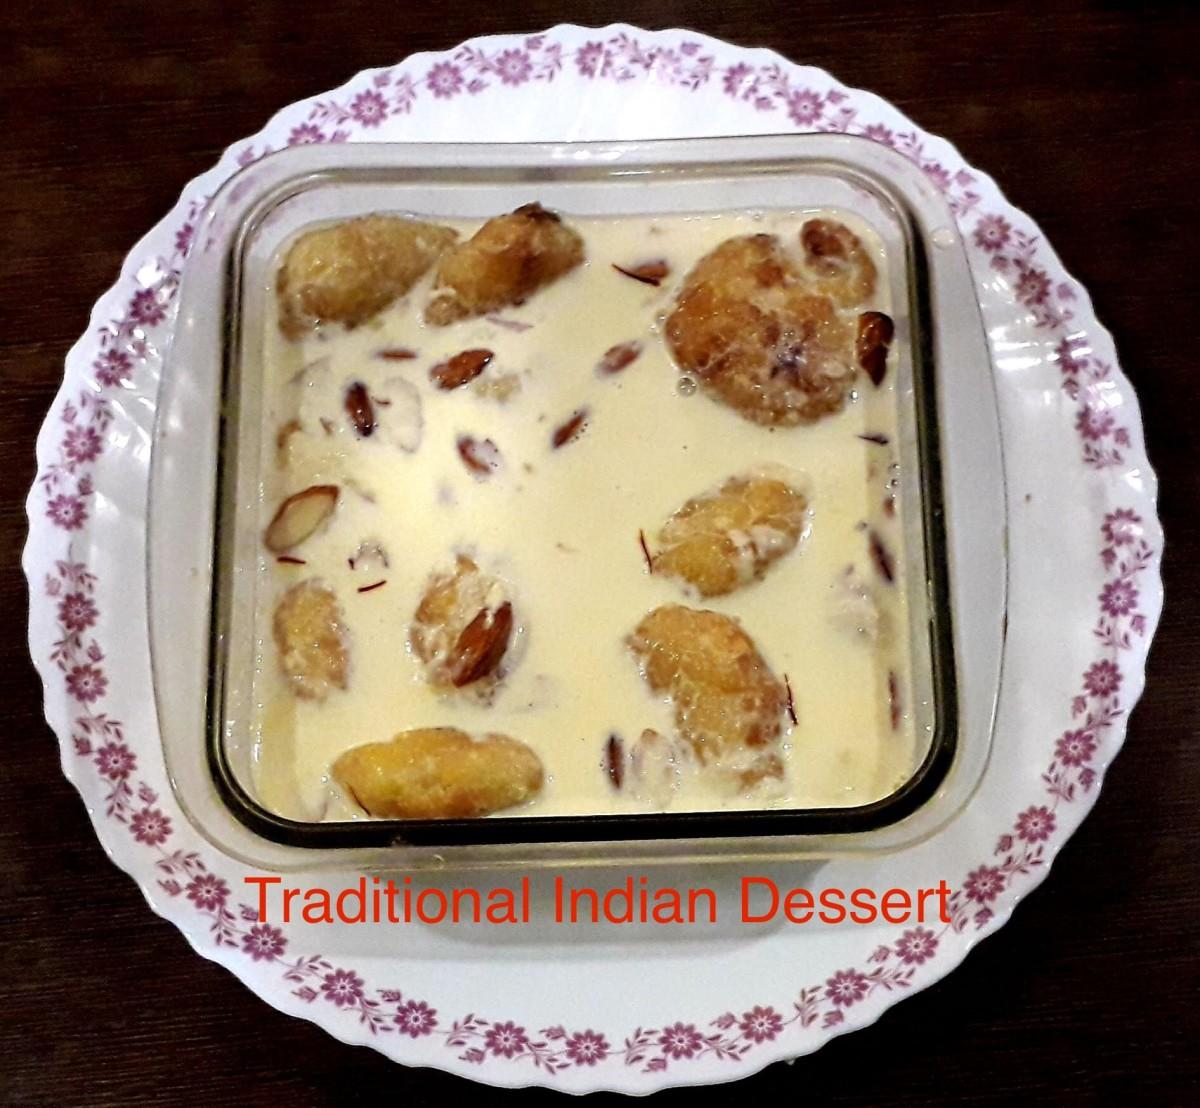 Traditional Indian Dessert—Creamy Malai Vada Recipe